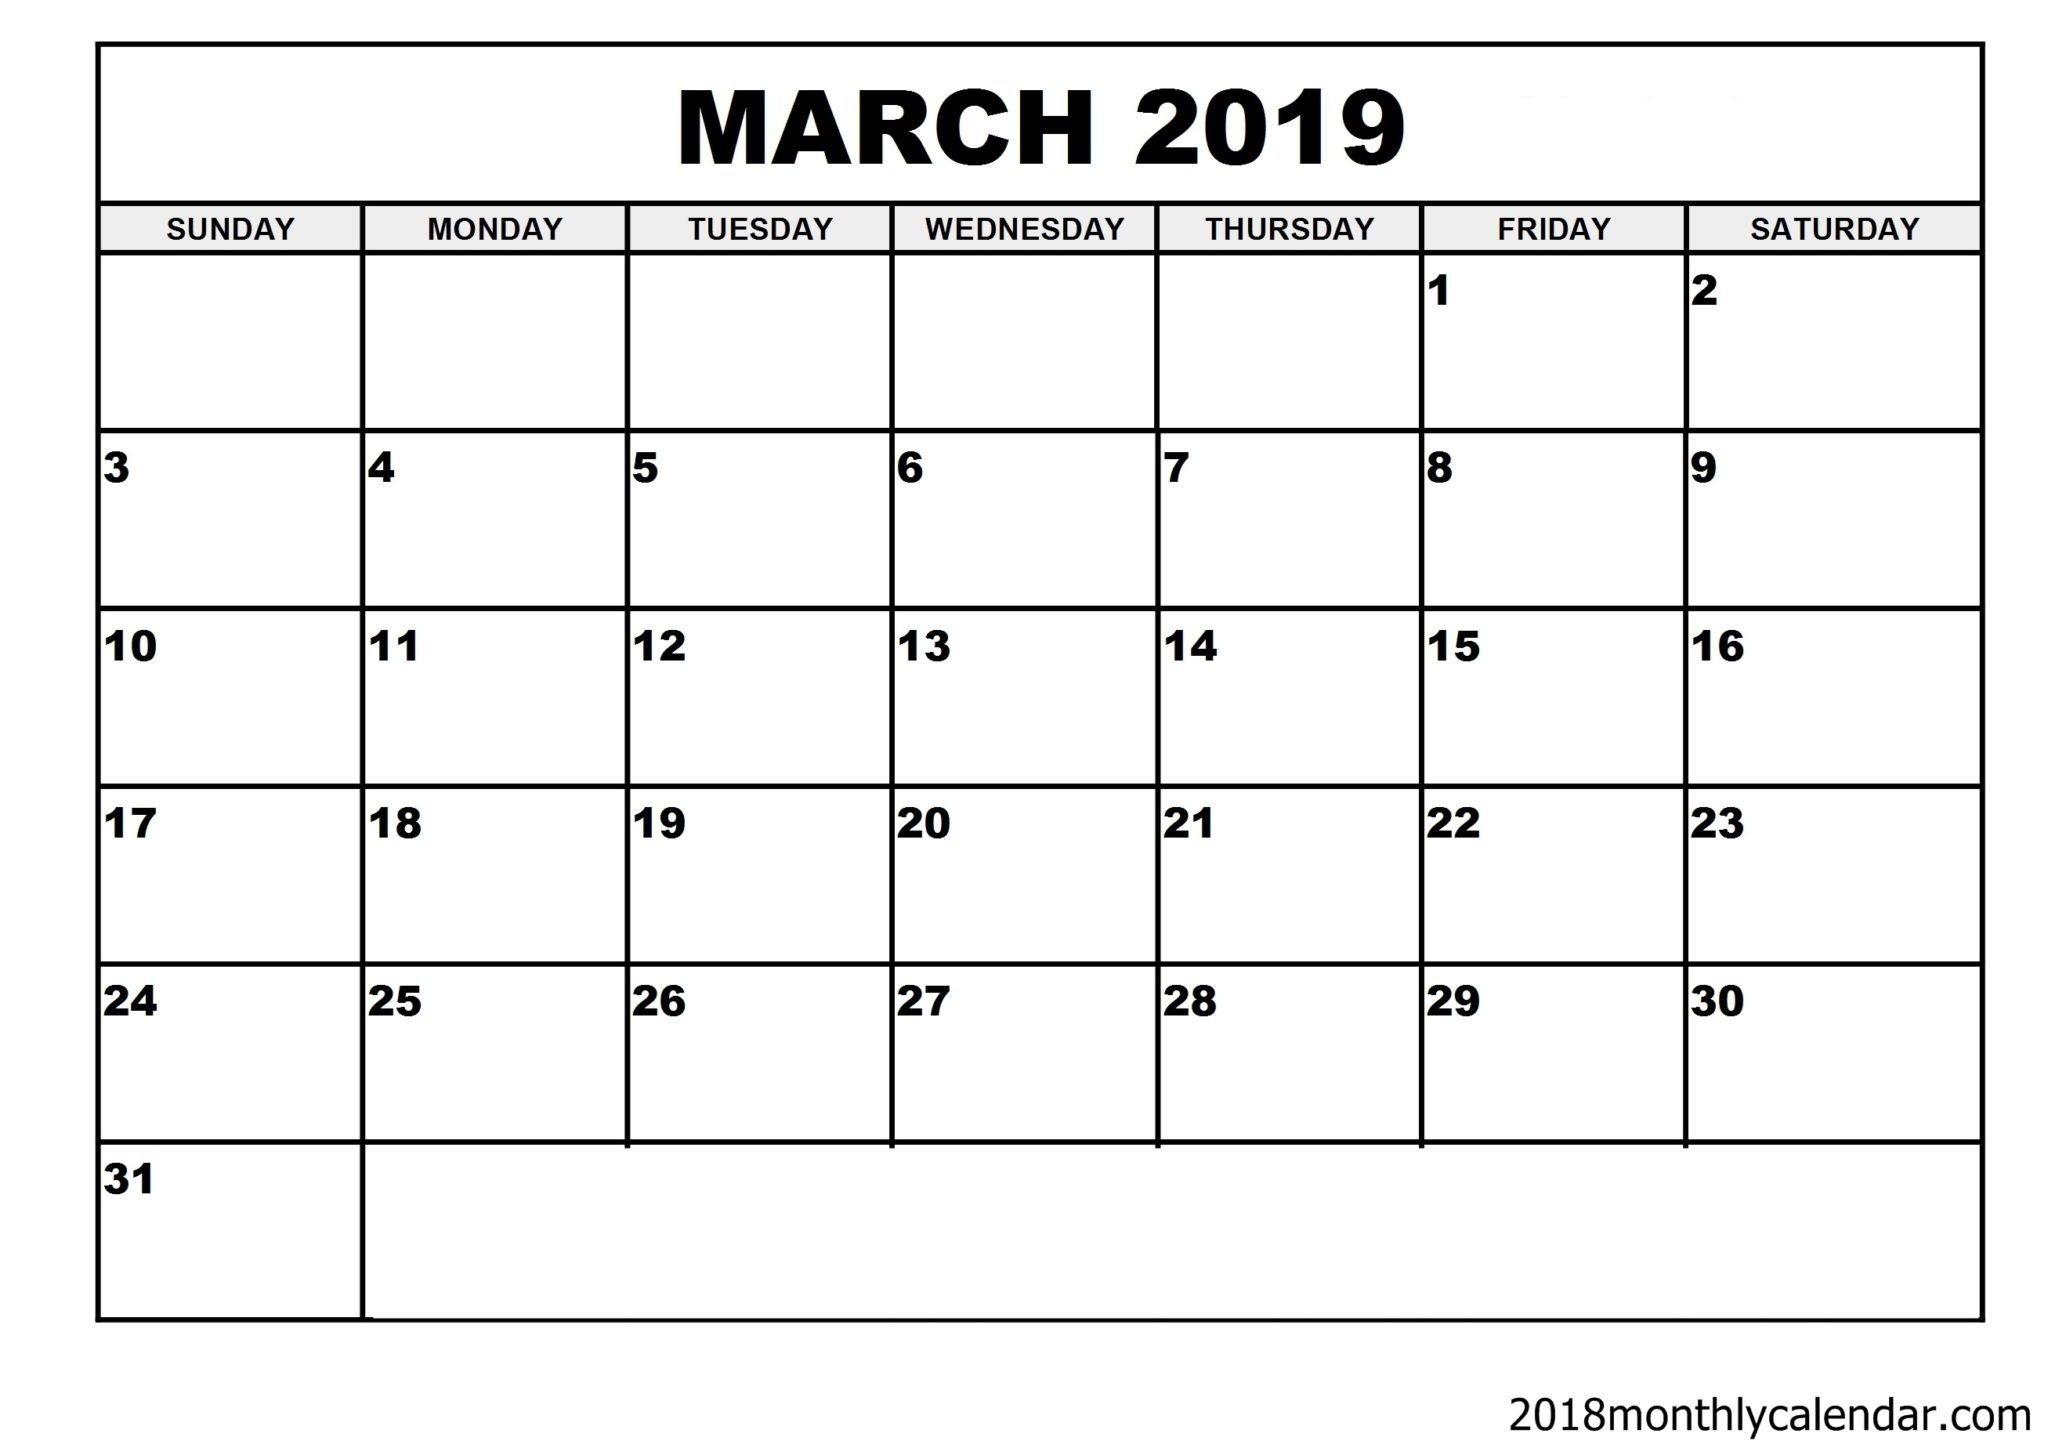 Download March 2019 Calendar – Blank Template - Editable Blank 31 Day Calendar Form